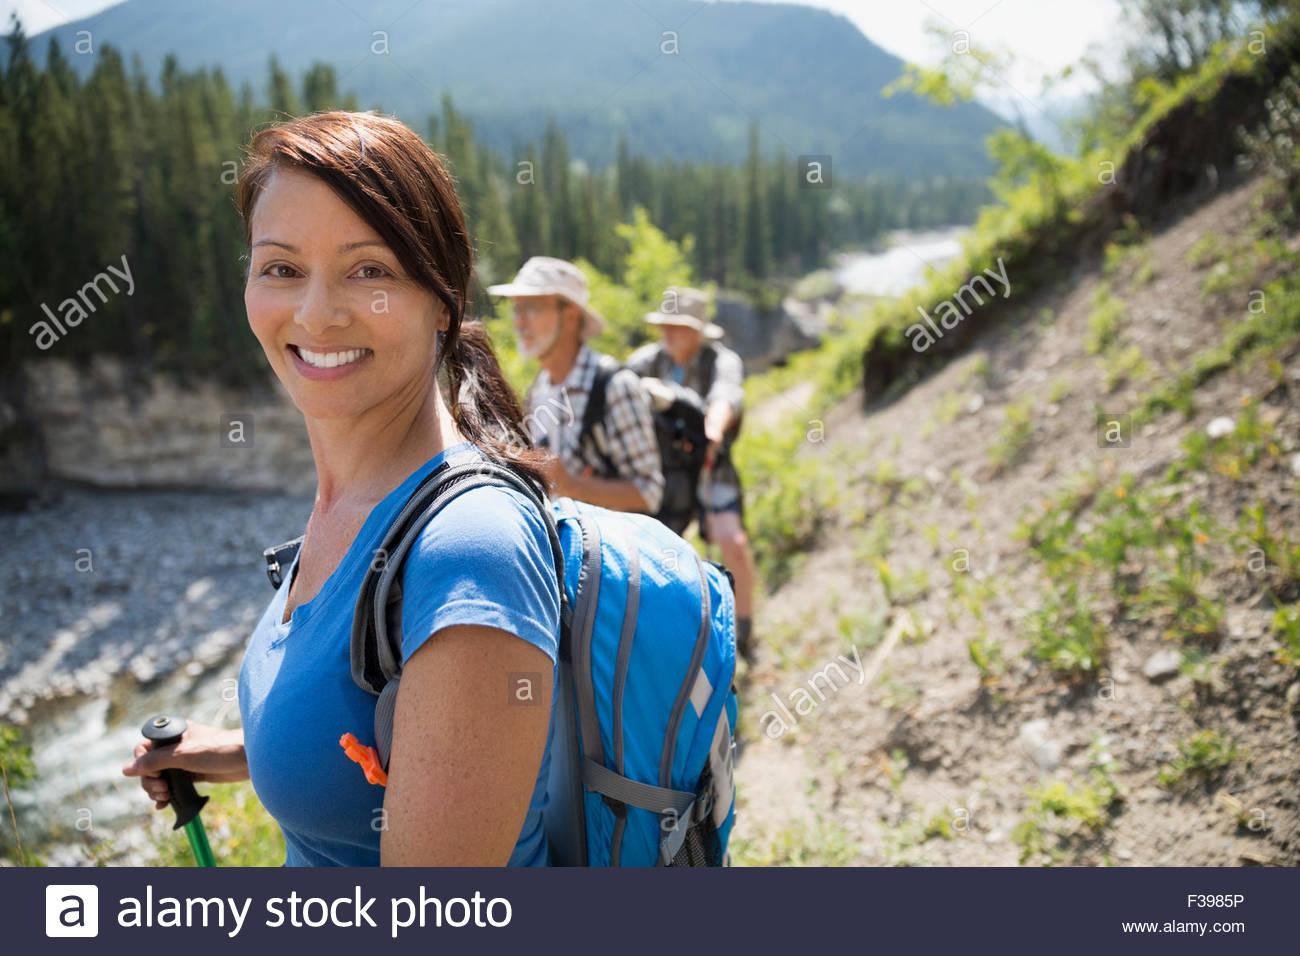 Retrato femenino sonriente caminante Imagen De Stock